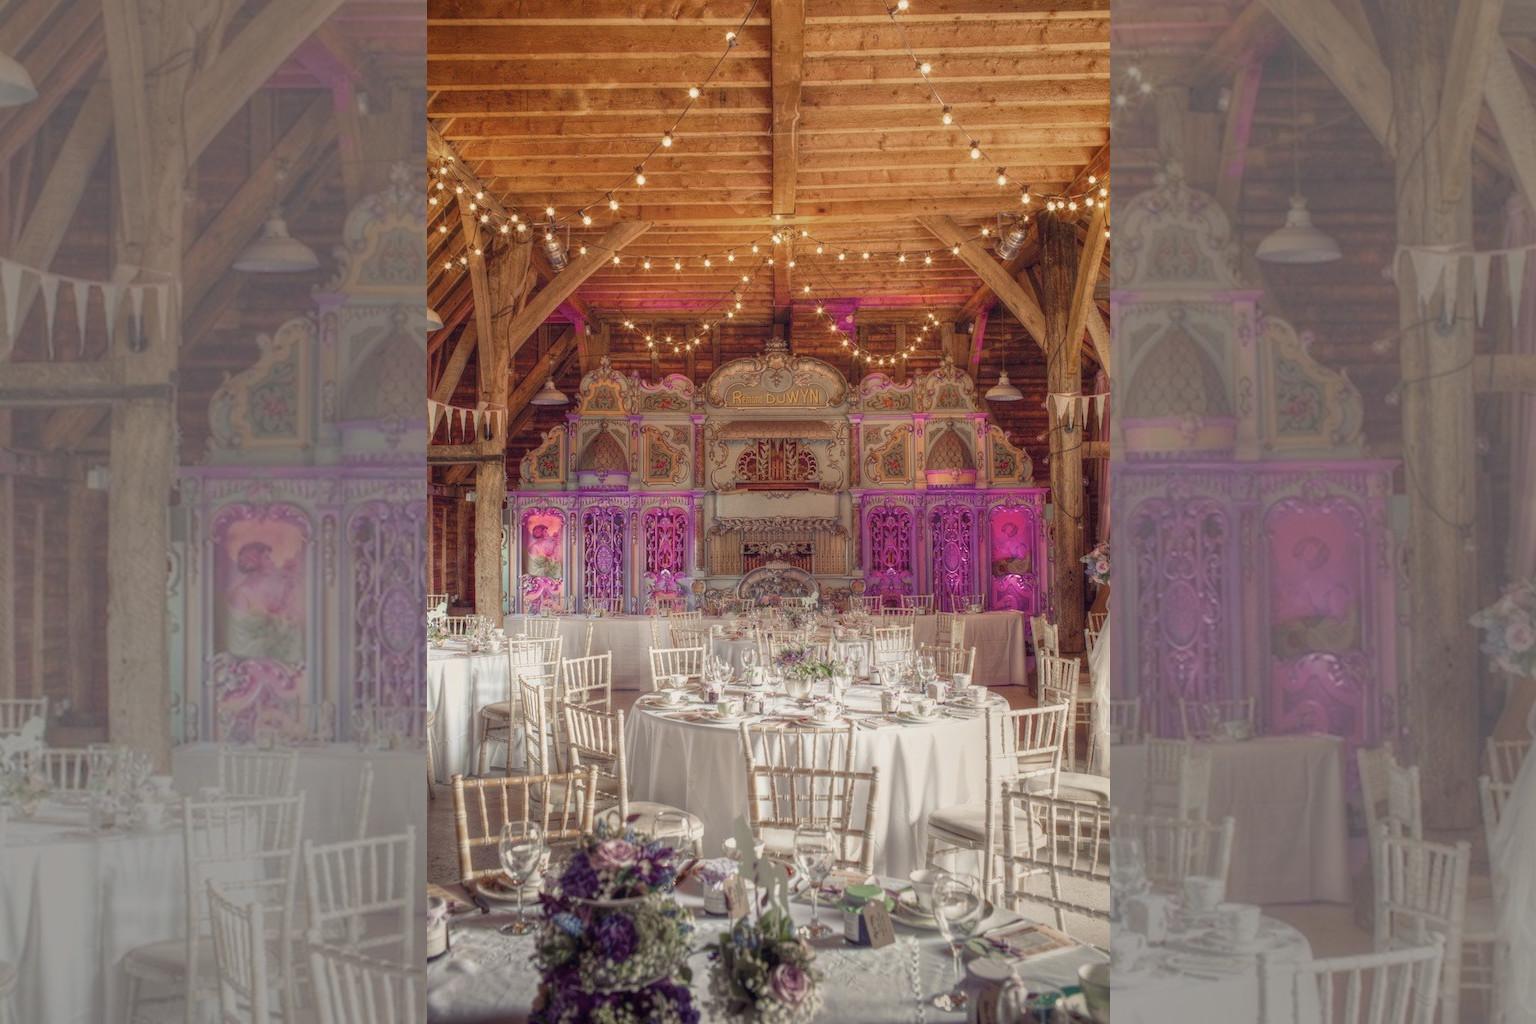 Bridebook.co.uk- quirky wedding venue set up for wedding breakfast